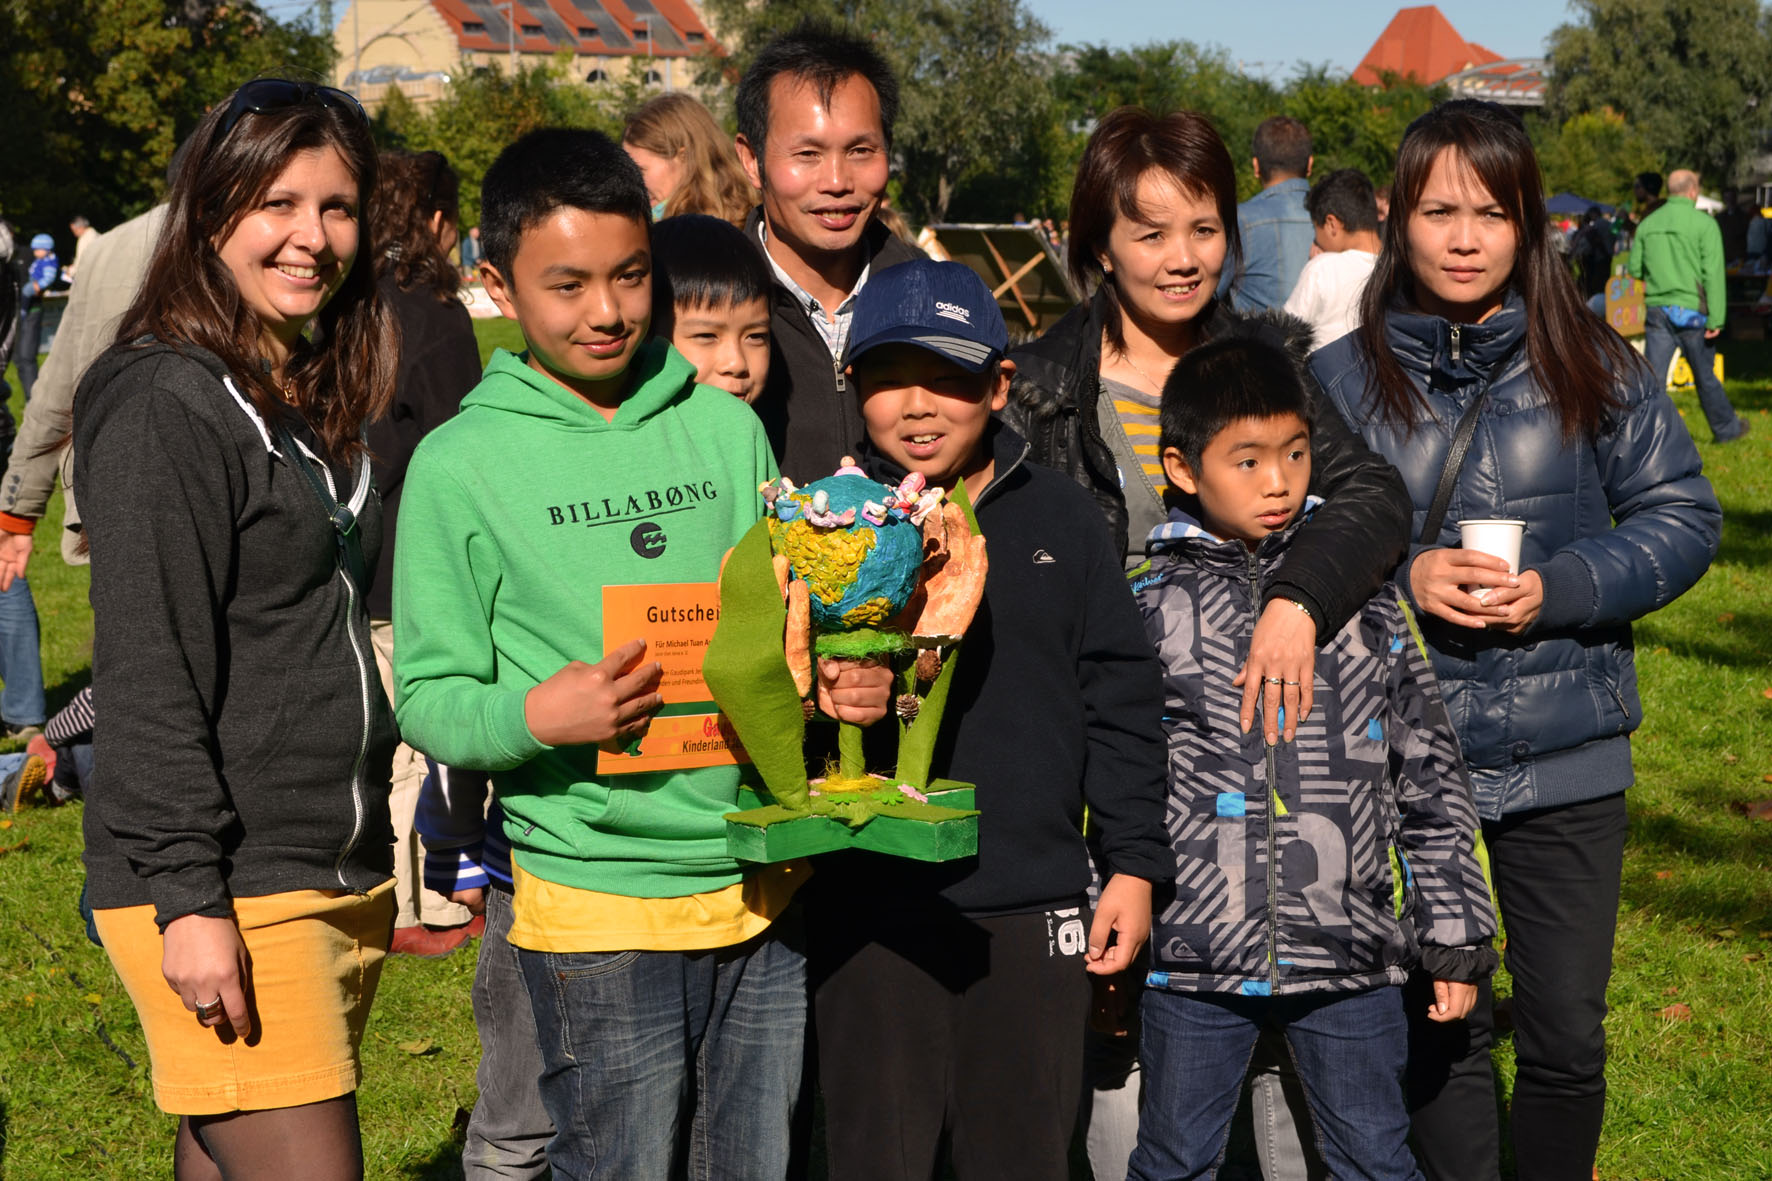 Michael Tuan Anh Vu, der Gewinner des Malwettbewerbes mit dem Wanderpokal